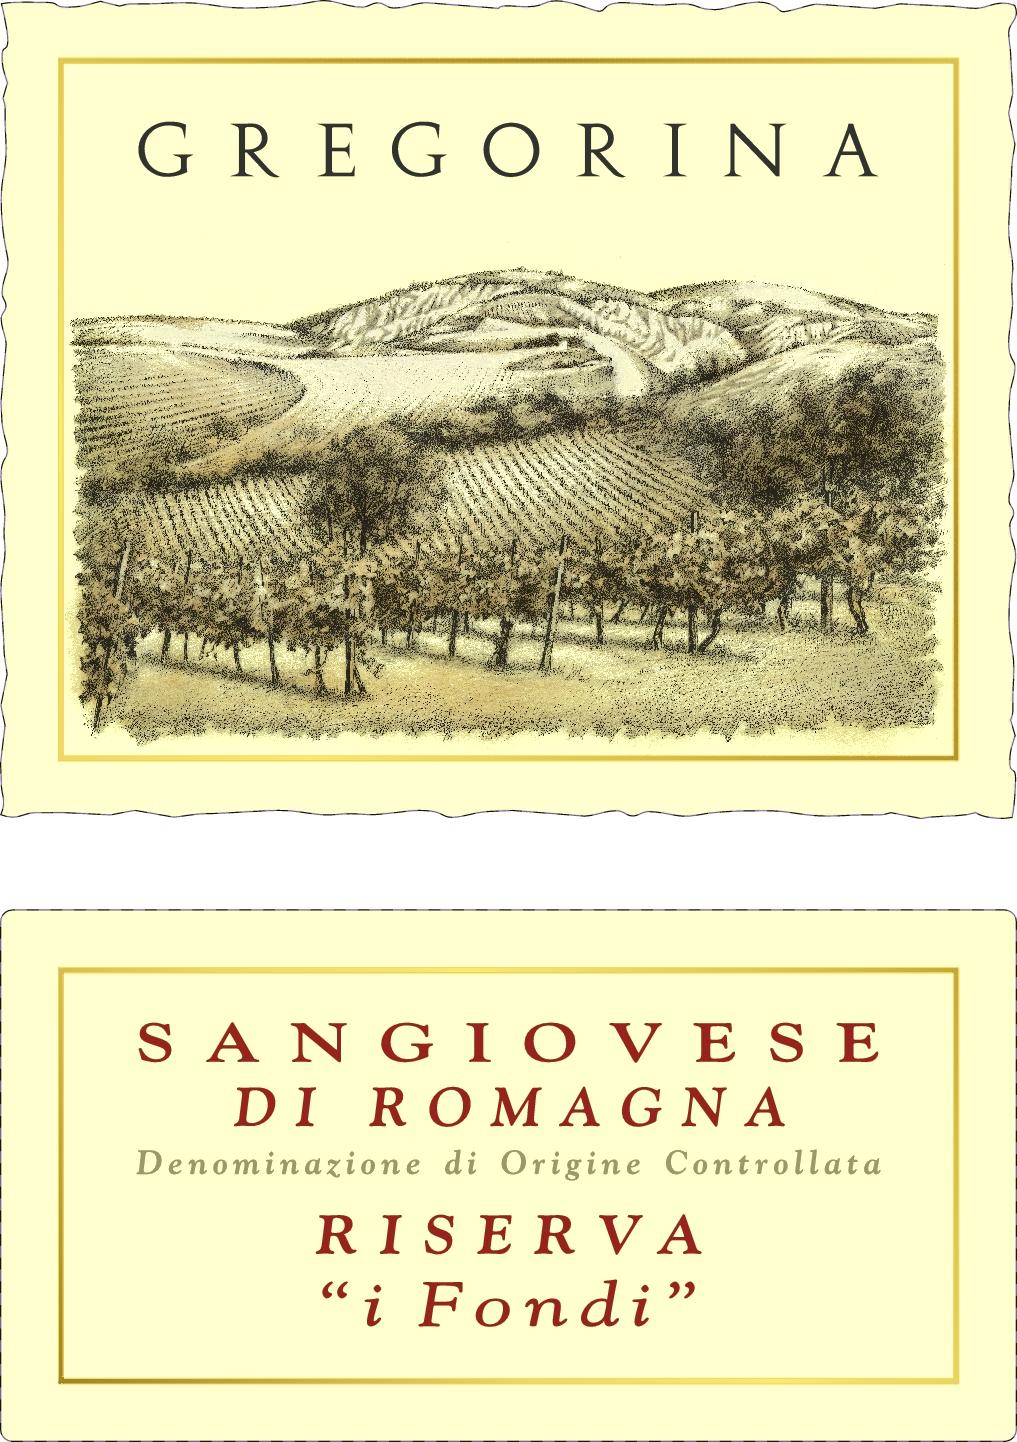 "谷丽桑娇维塞珍藏干红Gregorina Sangiovese Reserva ""i fondi"""